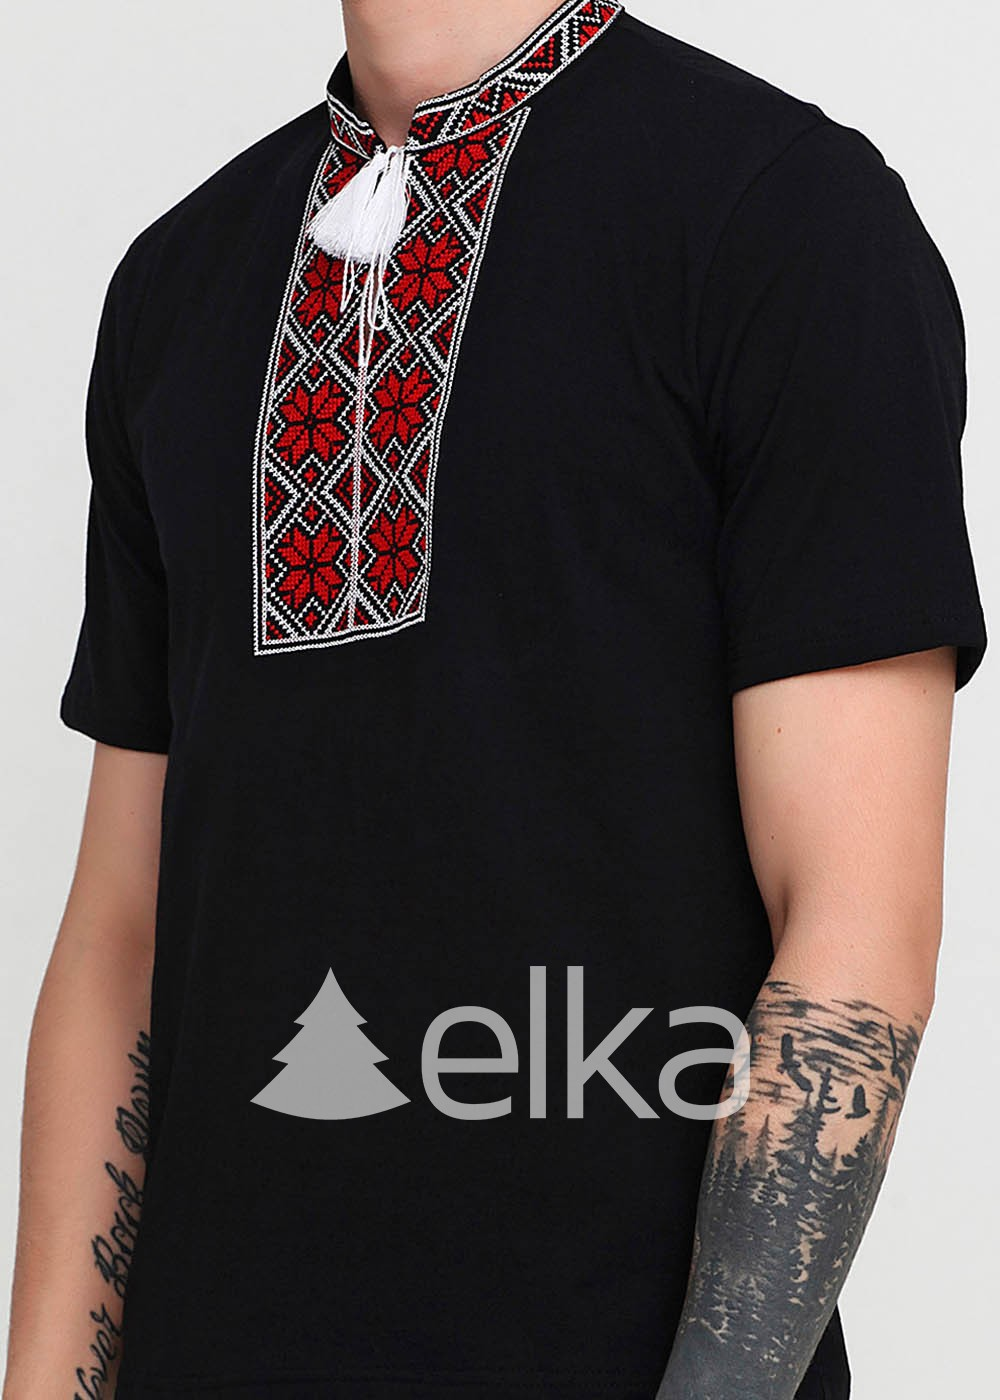 Мужская вышитая футболка Народная черная